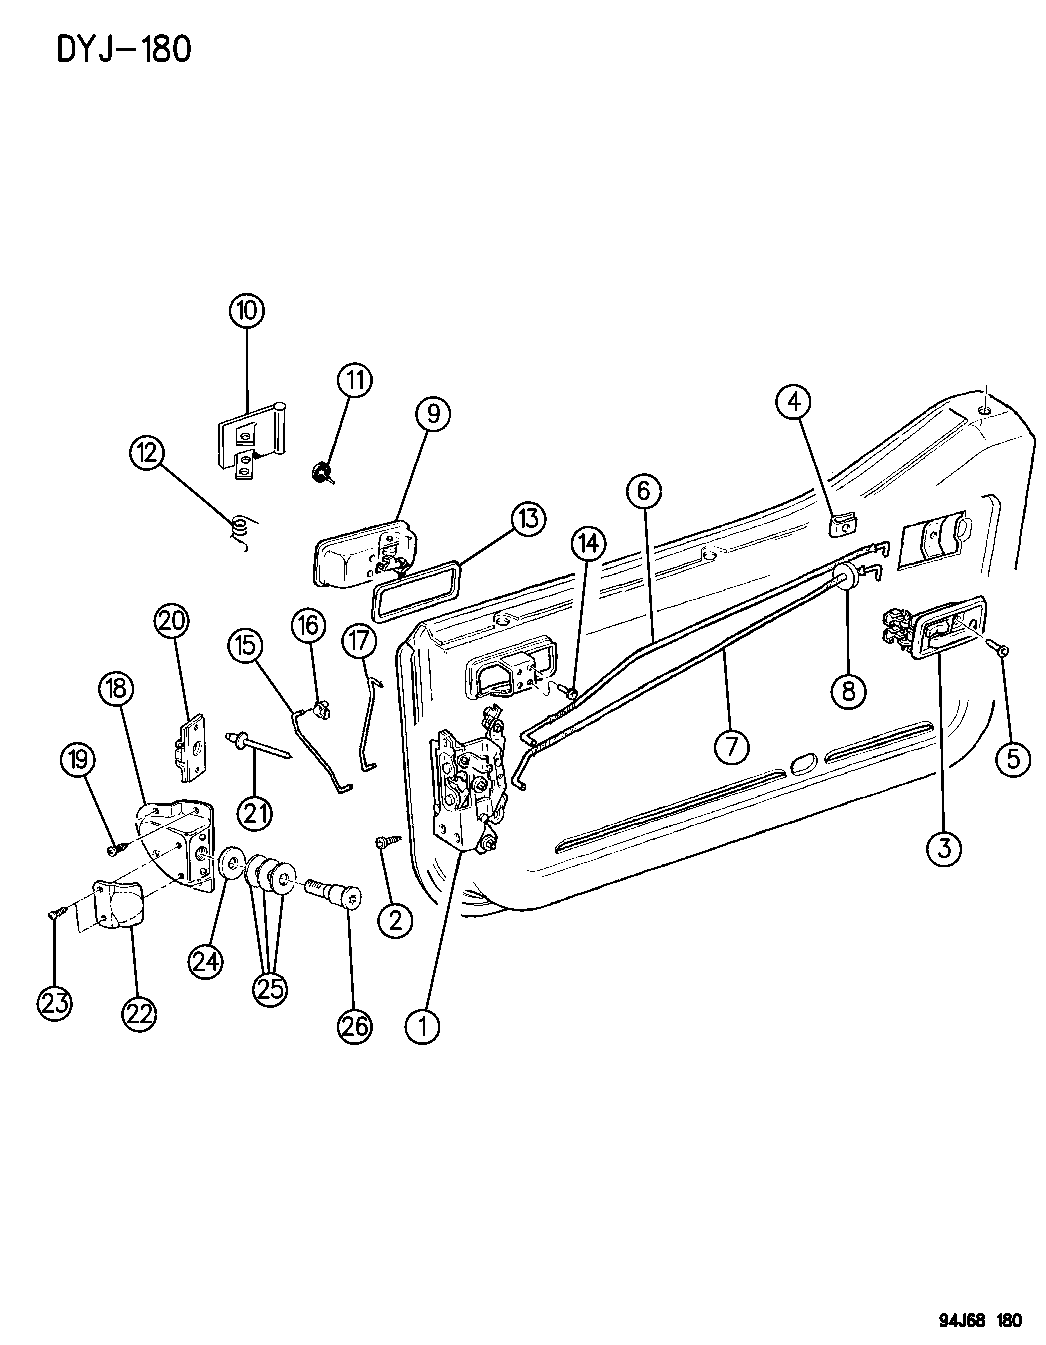 55075889 Genuine Mopar Link Inside Lock To Latch 1994 Jeep Wrangler Engine Diagram Door Front Half And Controls